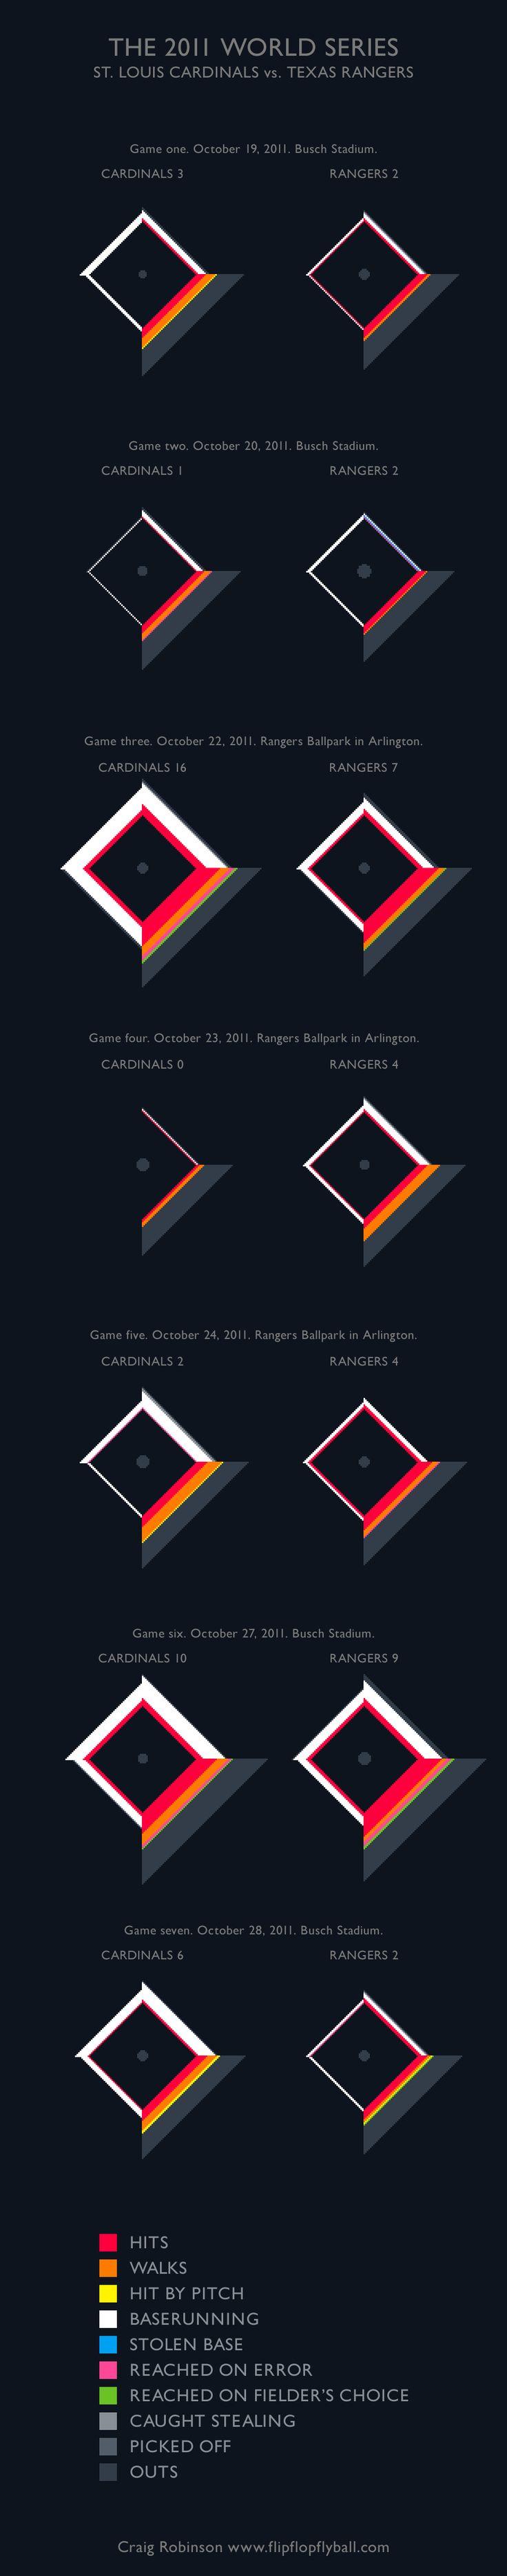 9142510b4 Data Visualization   Flip Flop Fly Ball - 2011 World Series - JobLoving.com